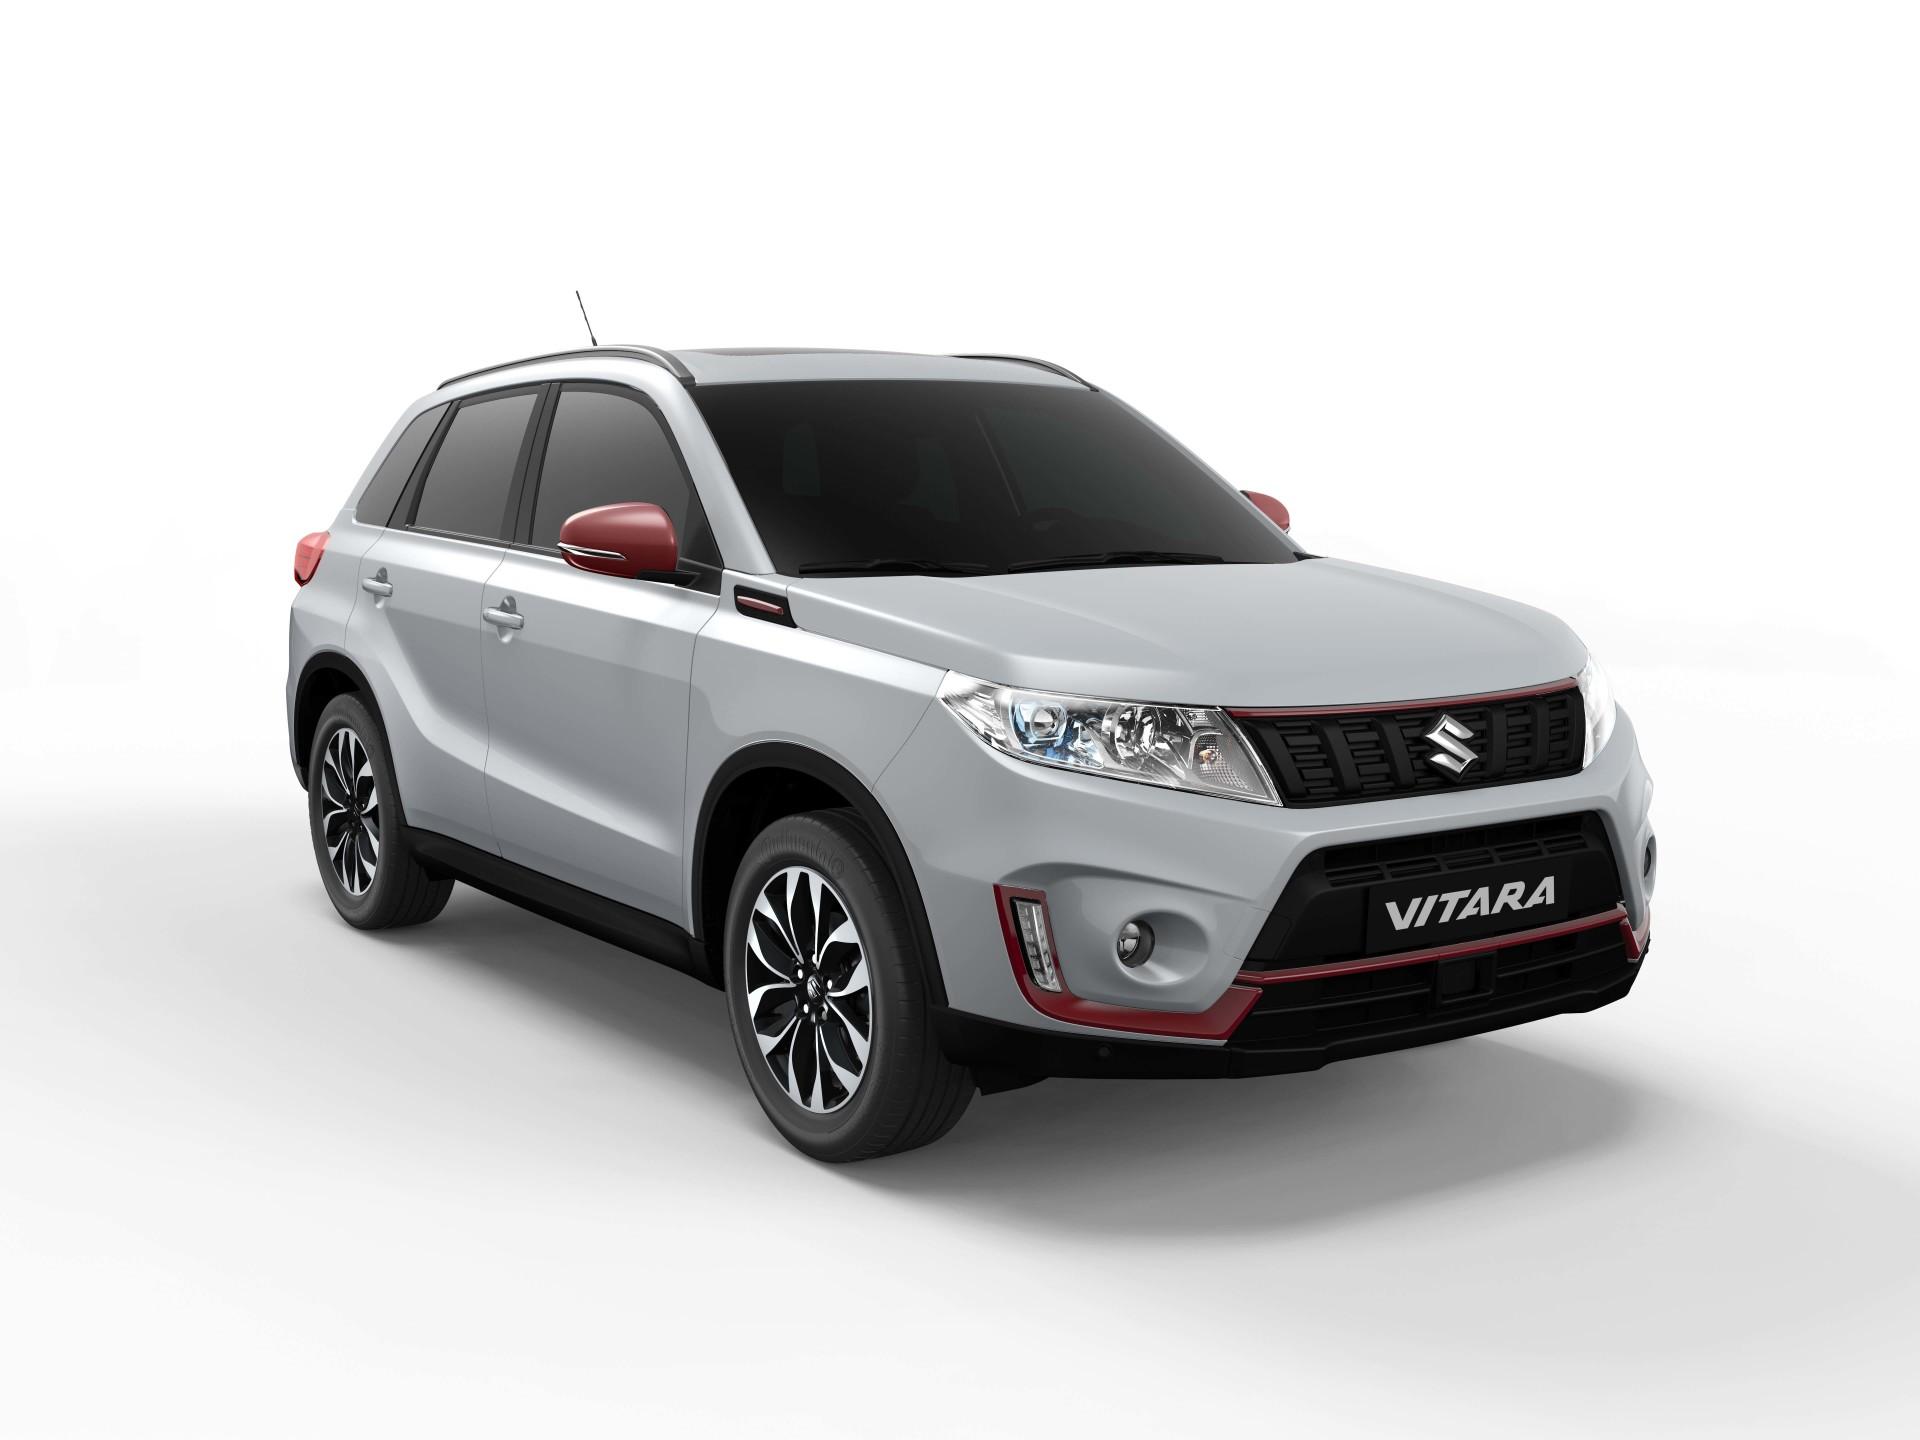 Suzuki Vitara 2018 Urban